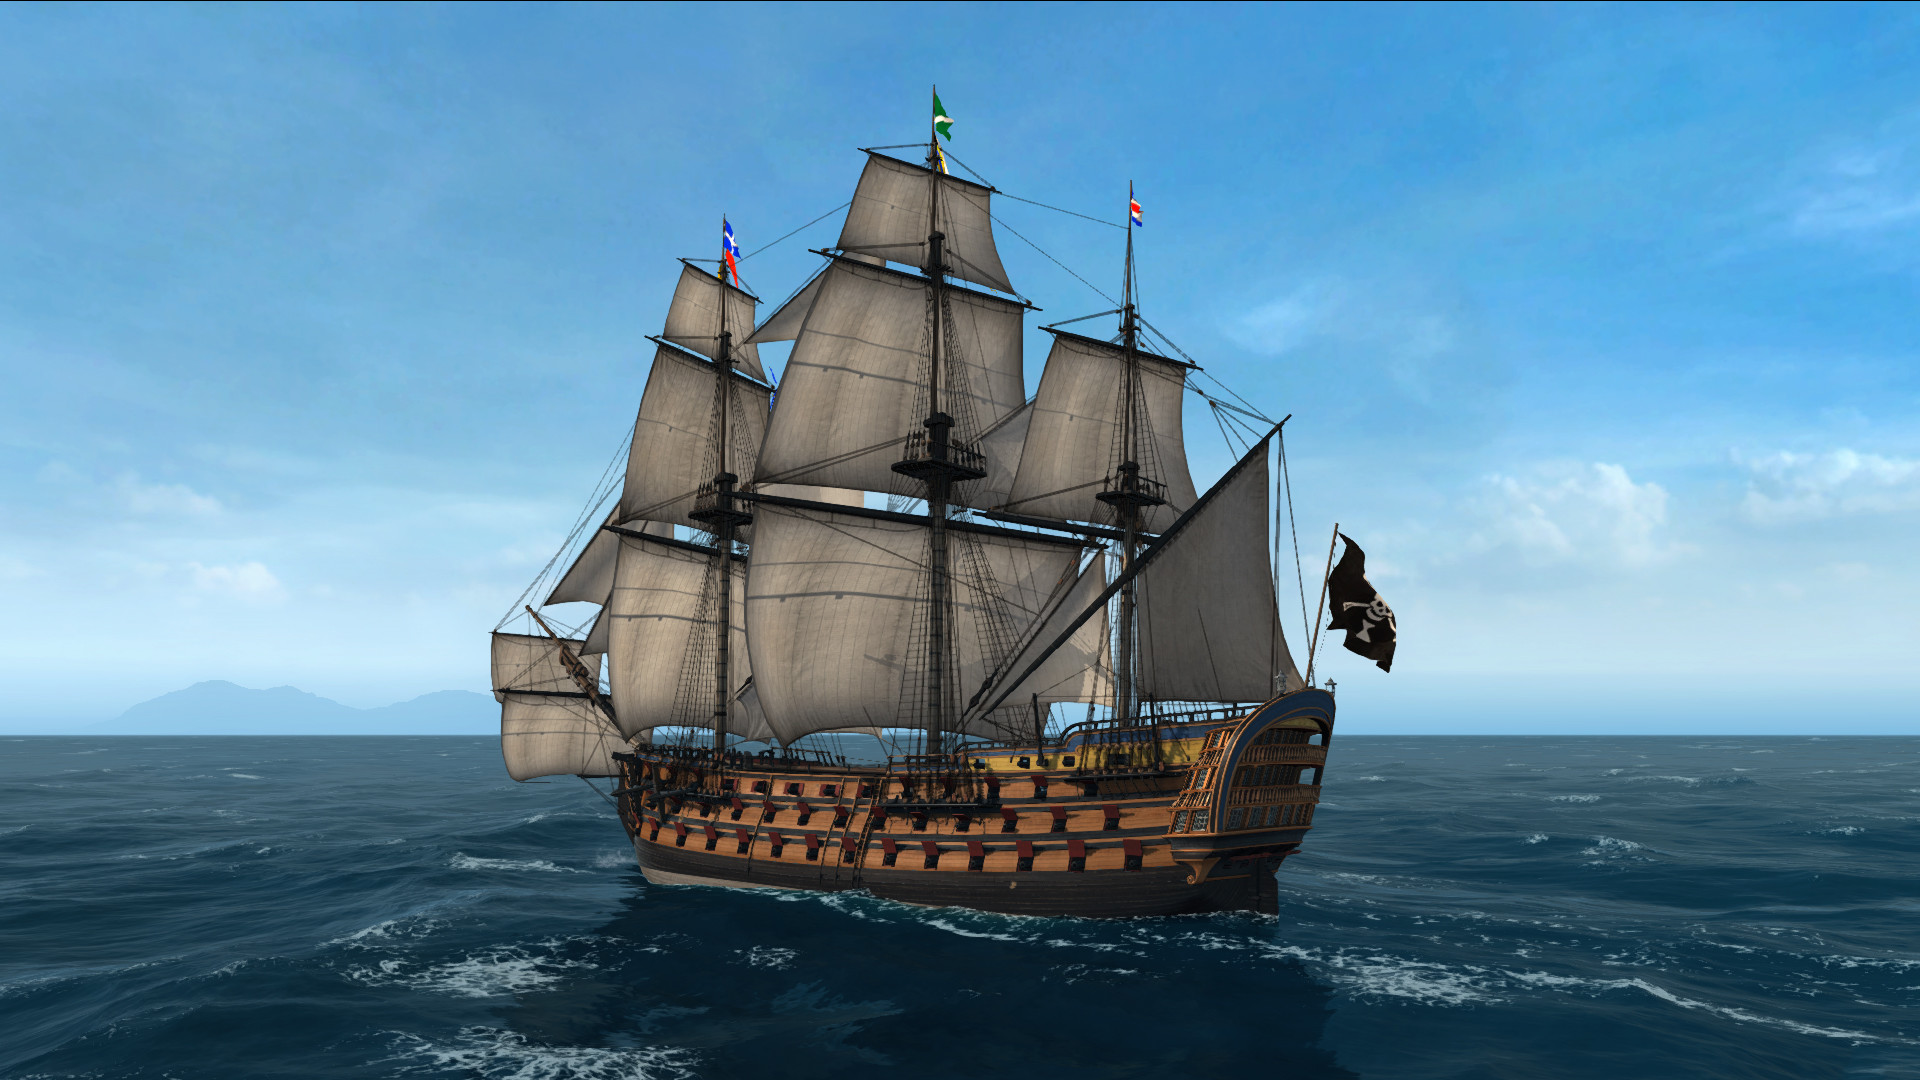 Naval Action - Santa Ana Fiyat Karşılaştırma